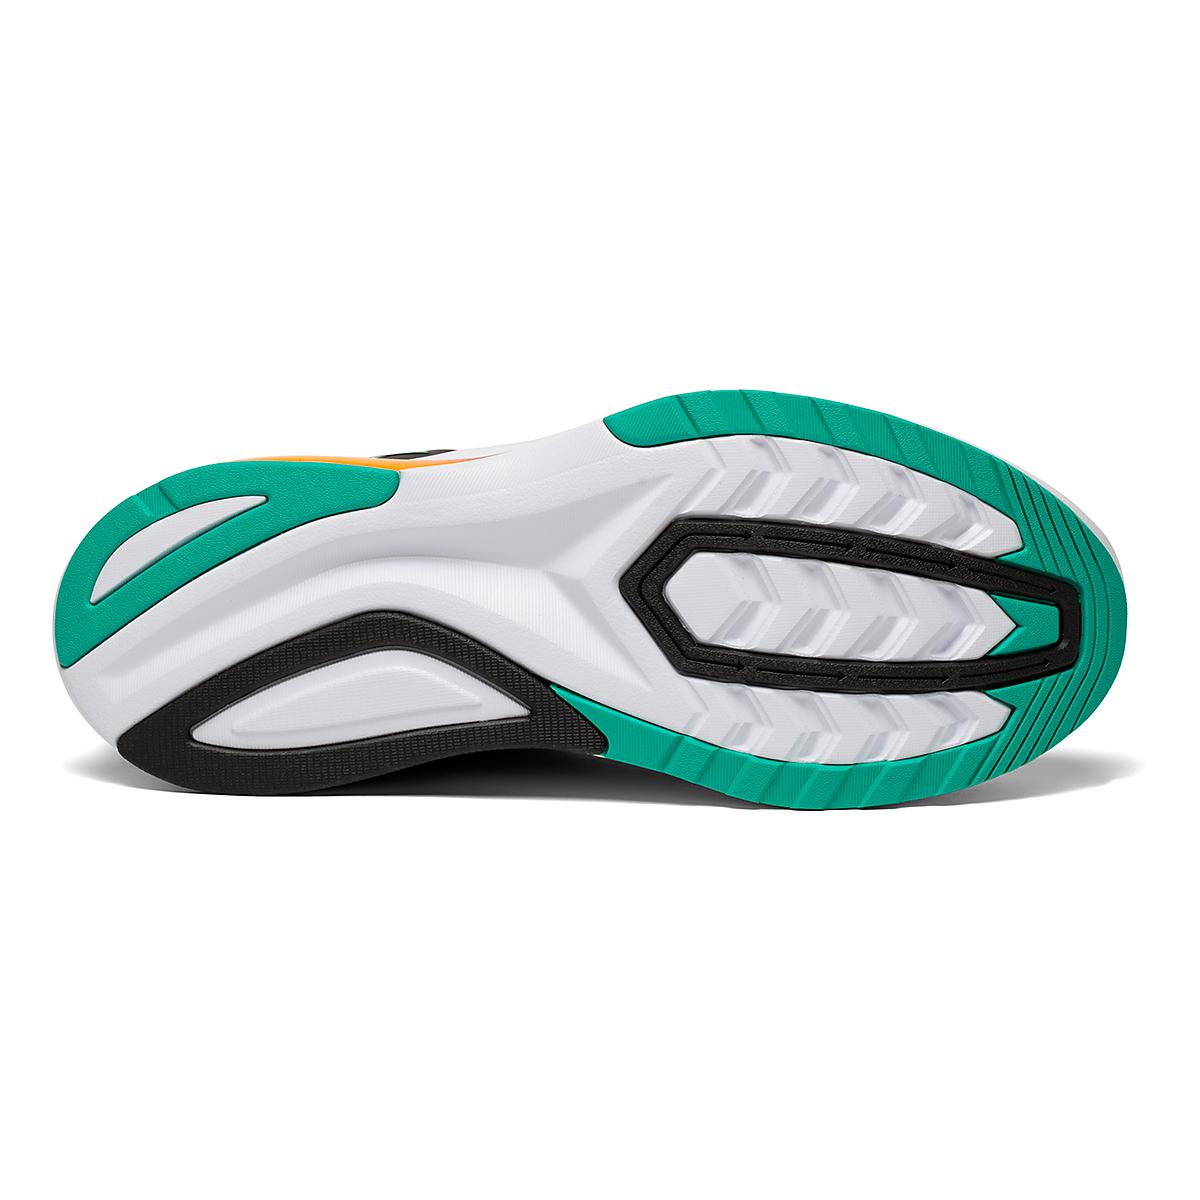 Men's Saucony Endorphin Shift 2 Running Shoe - Color: Alloy / Jade - Size: 7 - Width: Regular, Alloy / Jade, large, image 4